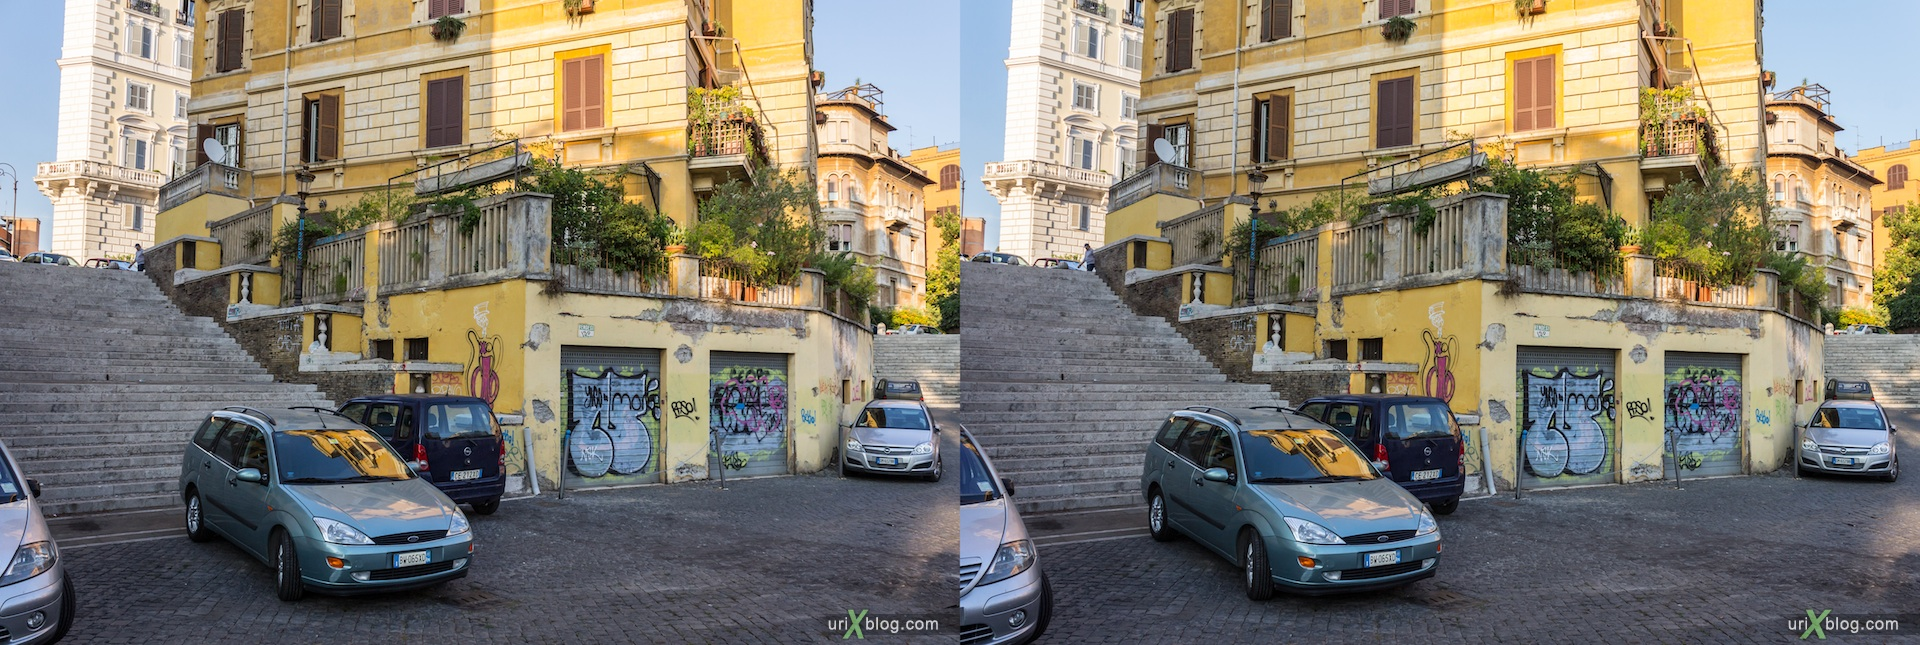 2012, Via della Domus Aurea street, 3D, stereo pair, cross-eyed, crossview, cross view stereo pair